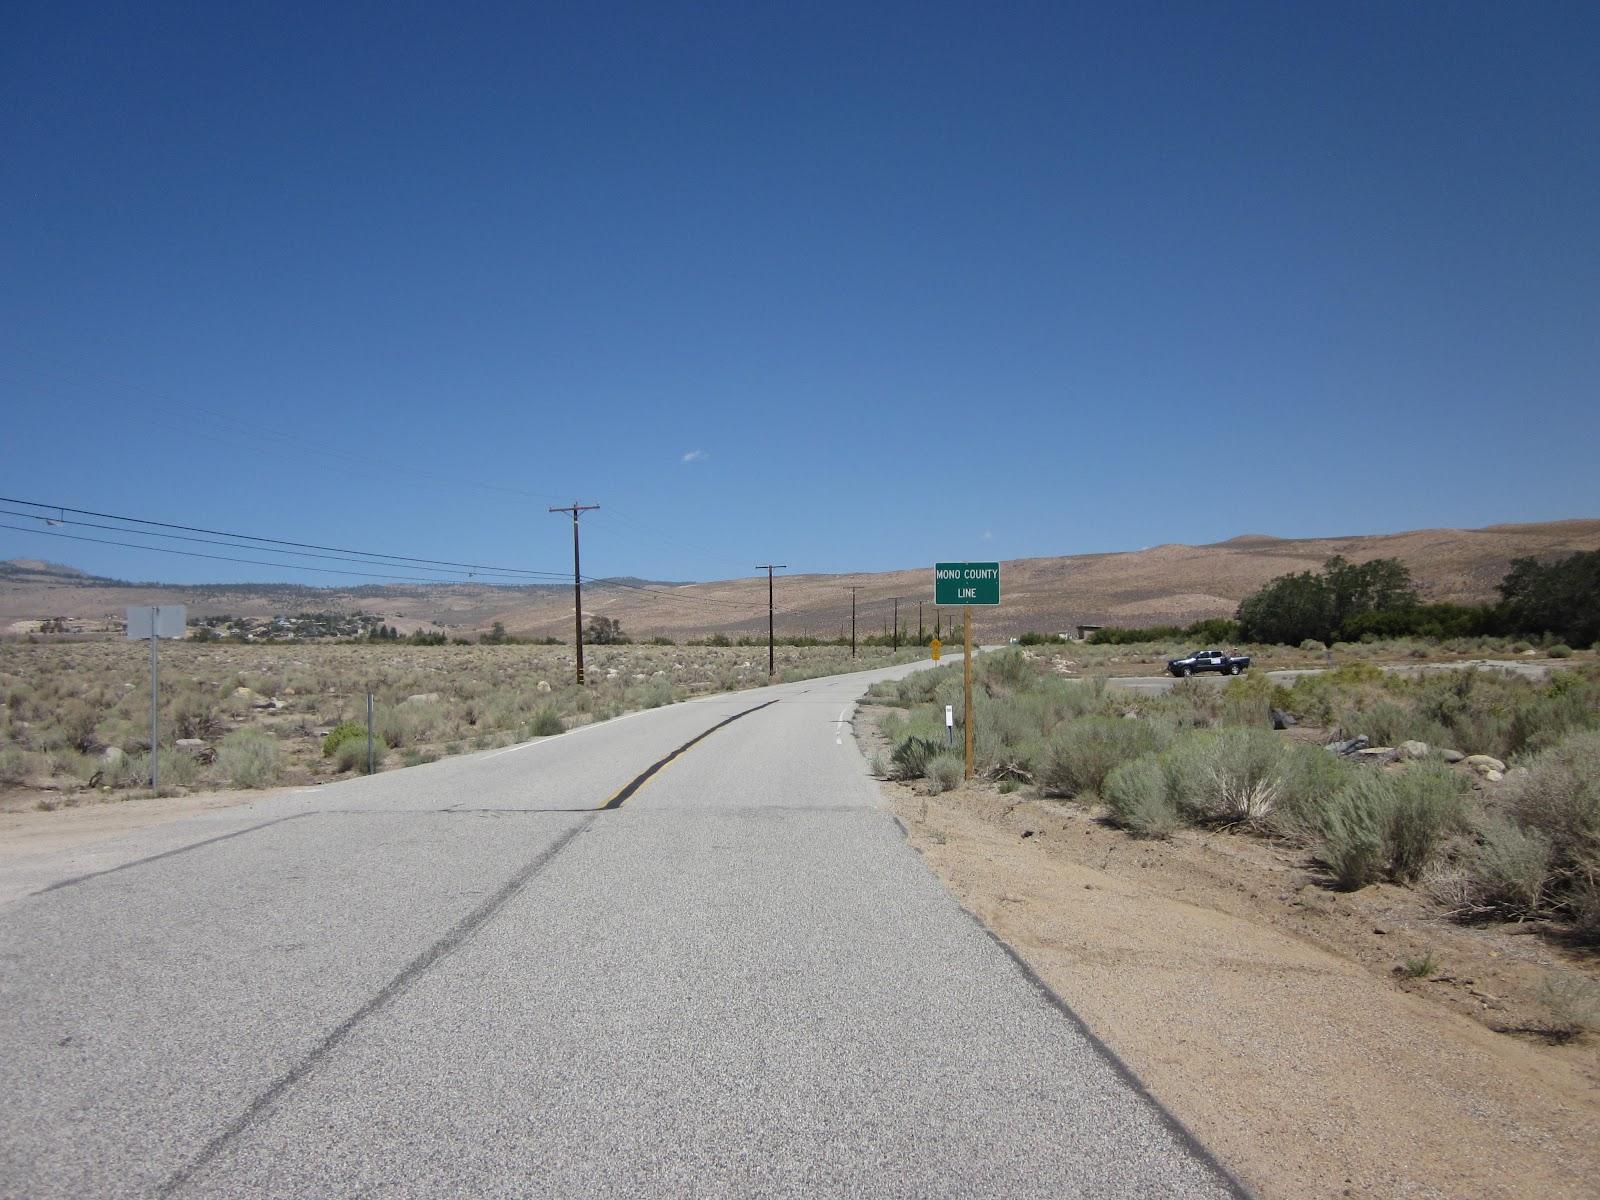 Beginning of Rock Creek Road climb by bike